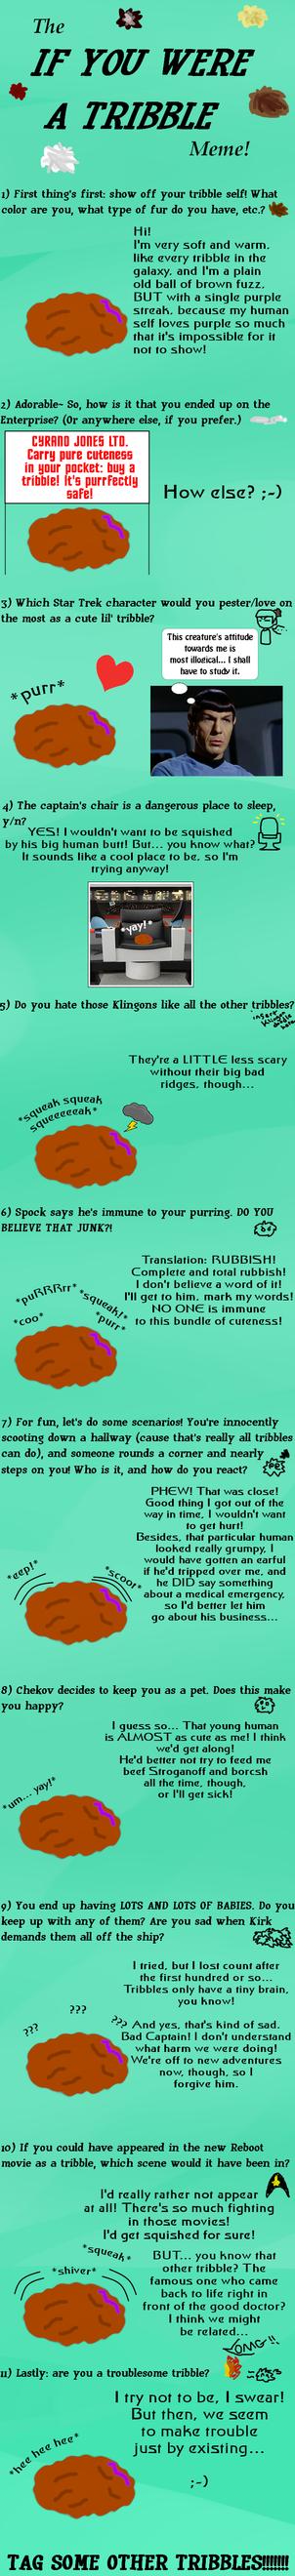 Tribble Meme by SweetOphelia4231616